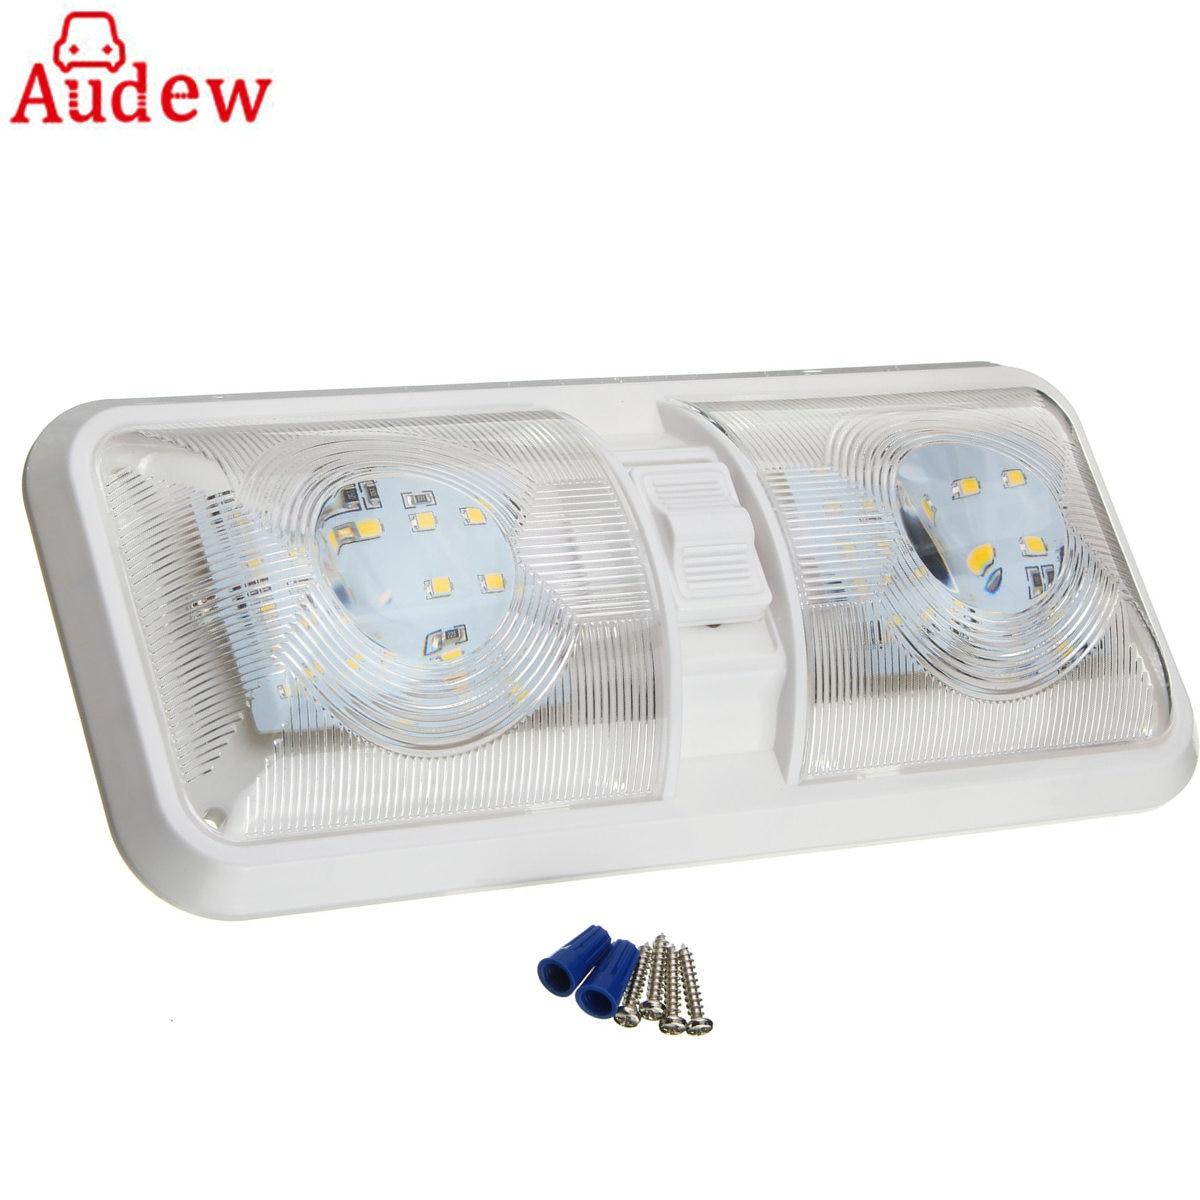 1Pcs Car Dome Light 12V 48 LED Interior Roof Ceiling Reading Lamp For RV Boat For